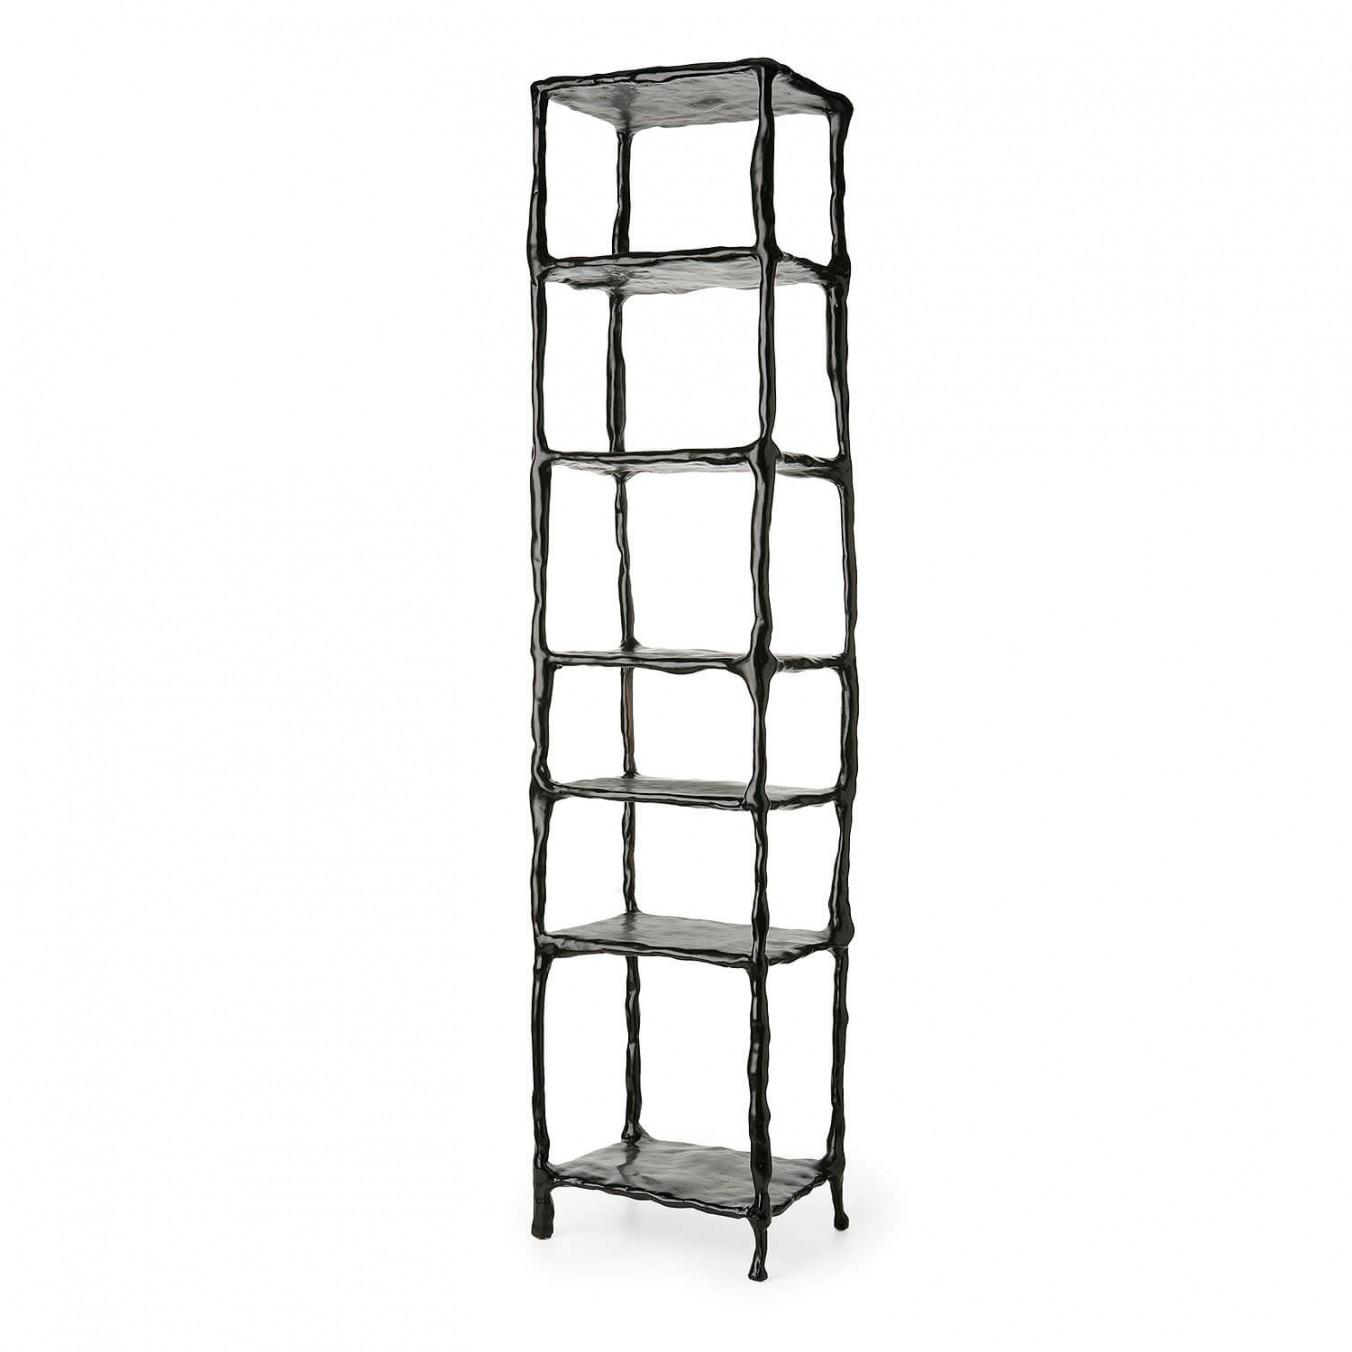 Clay bookshelves